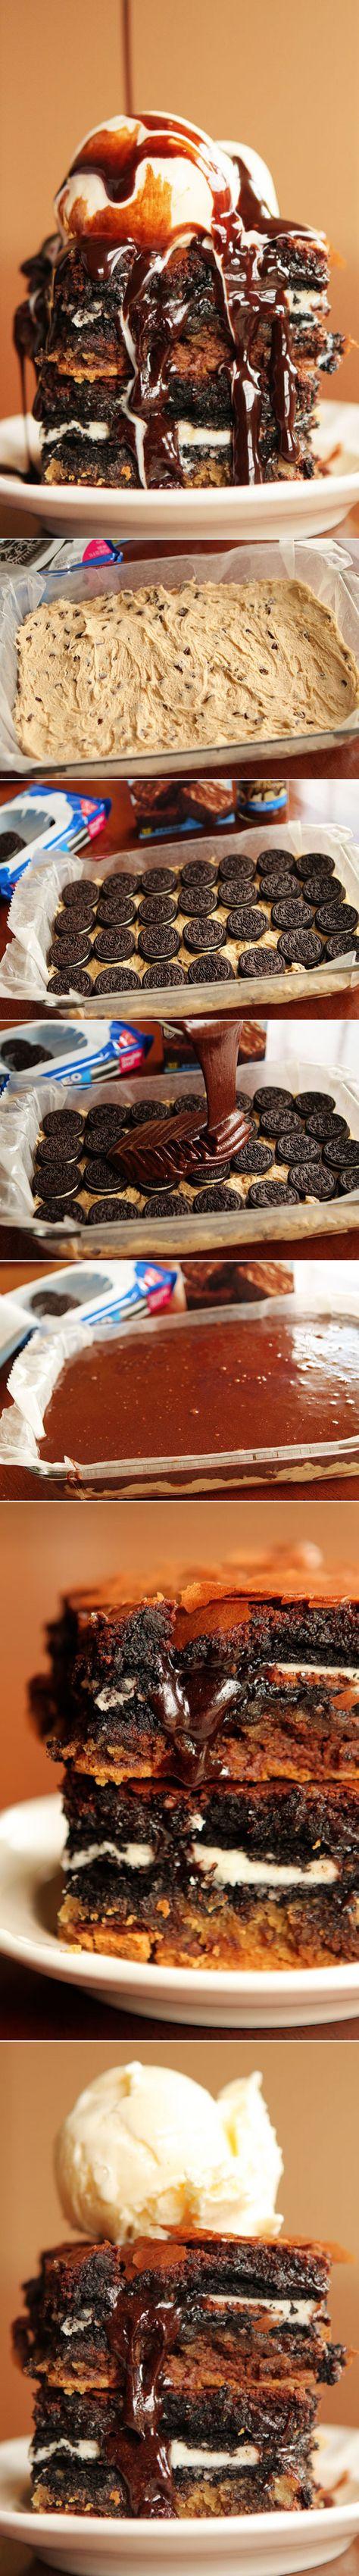 Ultimate Chocolate Chip Cookie n' Oreo Fudge Brownie Bar ~ Cookie Dough + Oreos +, Brownie Batter!! This is the original recipe!